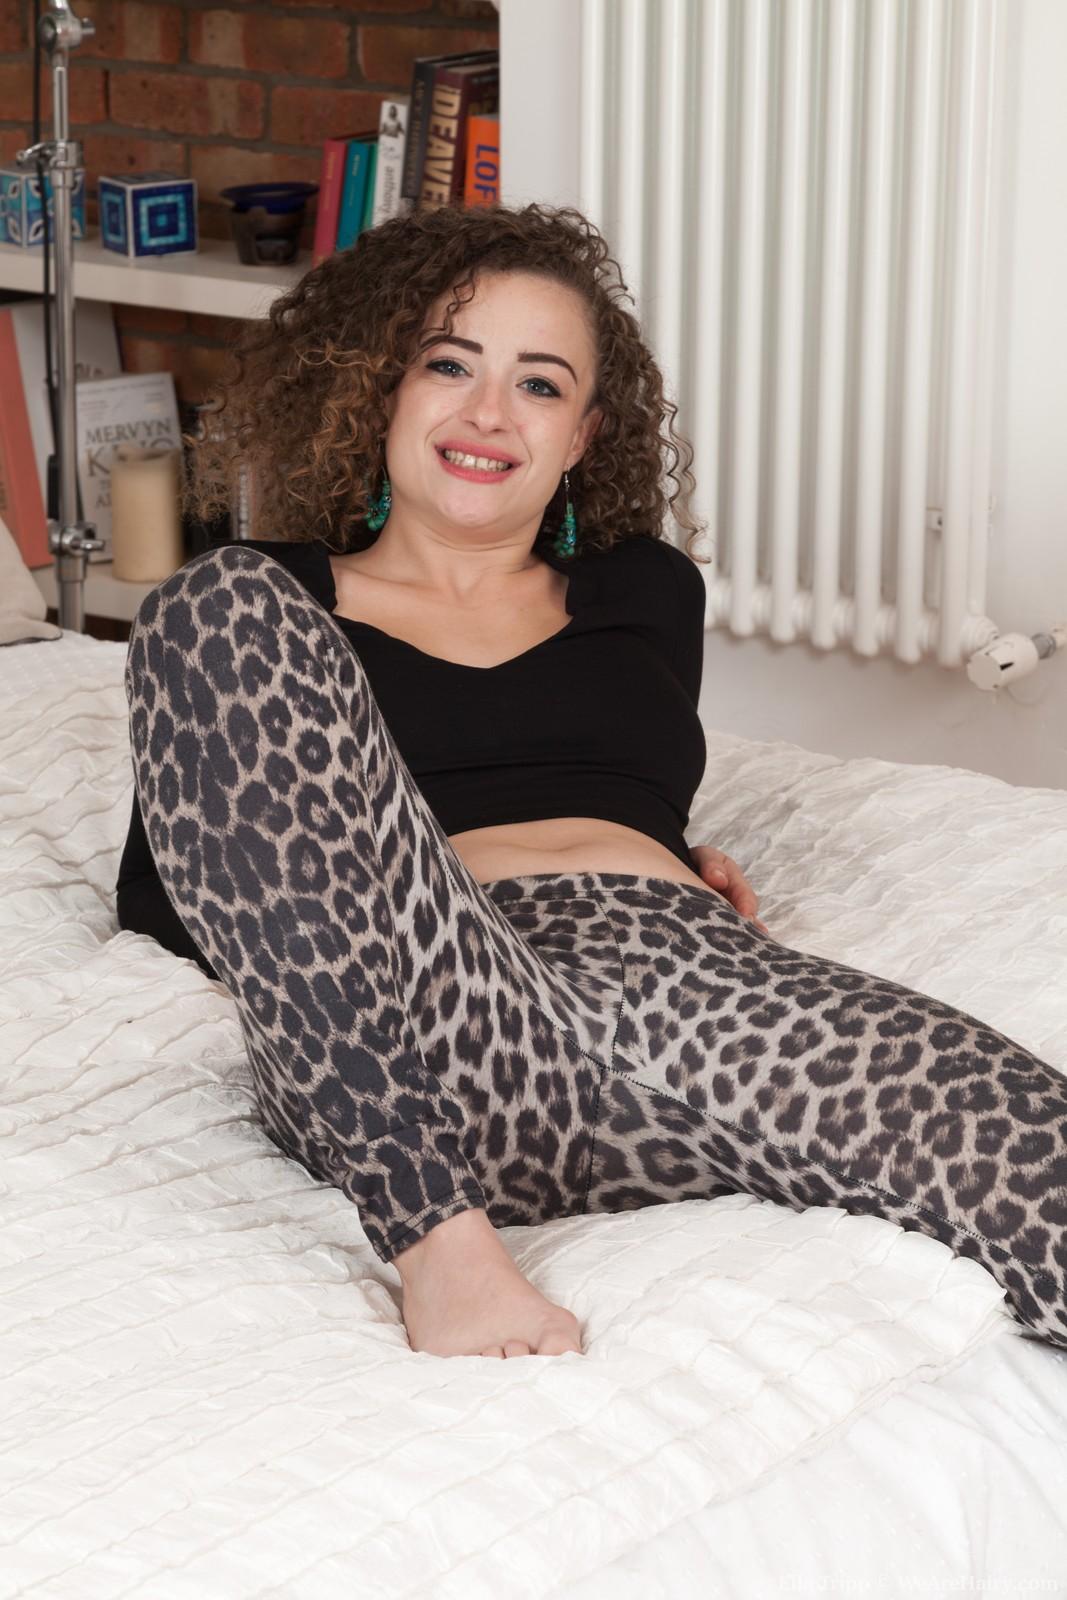 Ella Tripp models her new leopard pants in bed